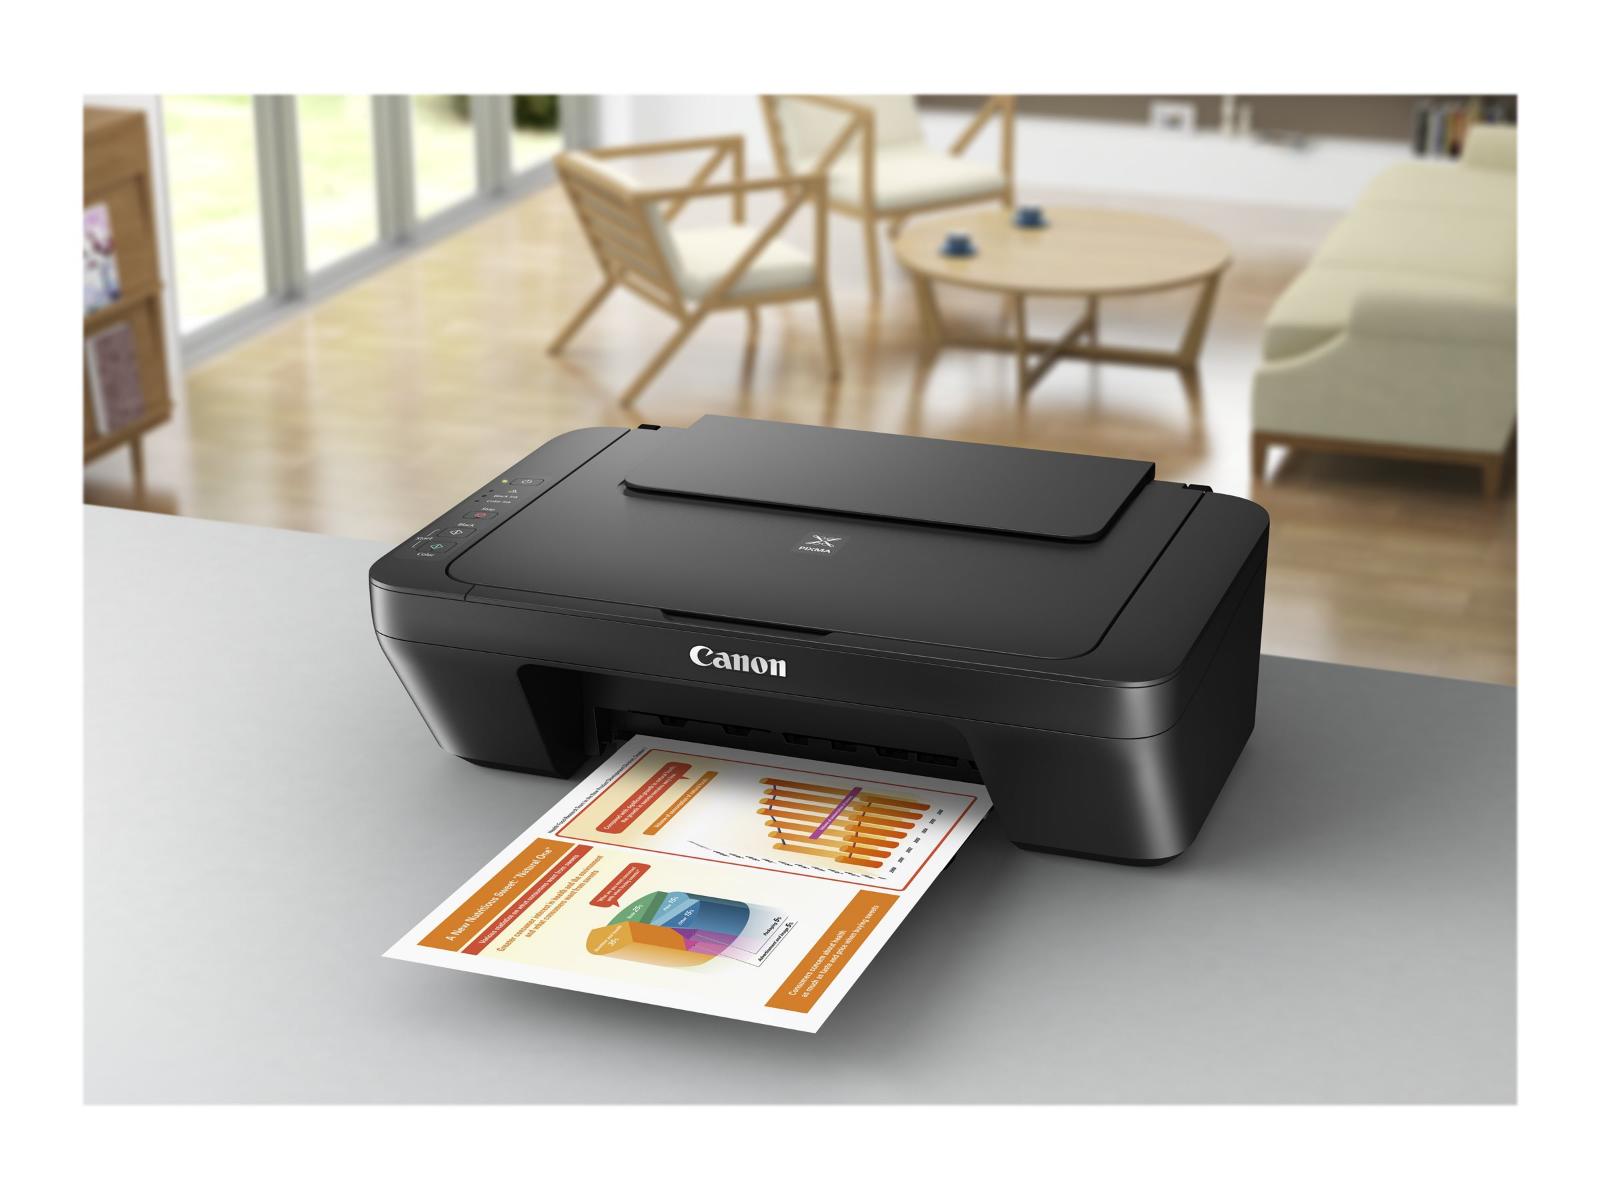 Canon PIXMA MG2550S - Multifunktionsdrucker - Farbe - Tintenstrahl - 0727C006